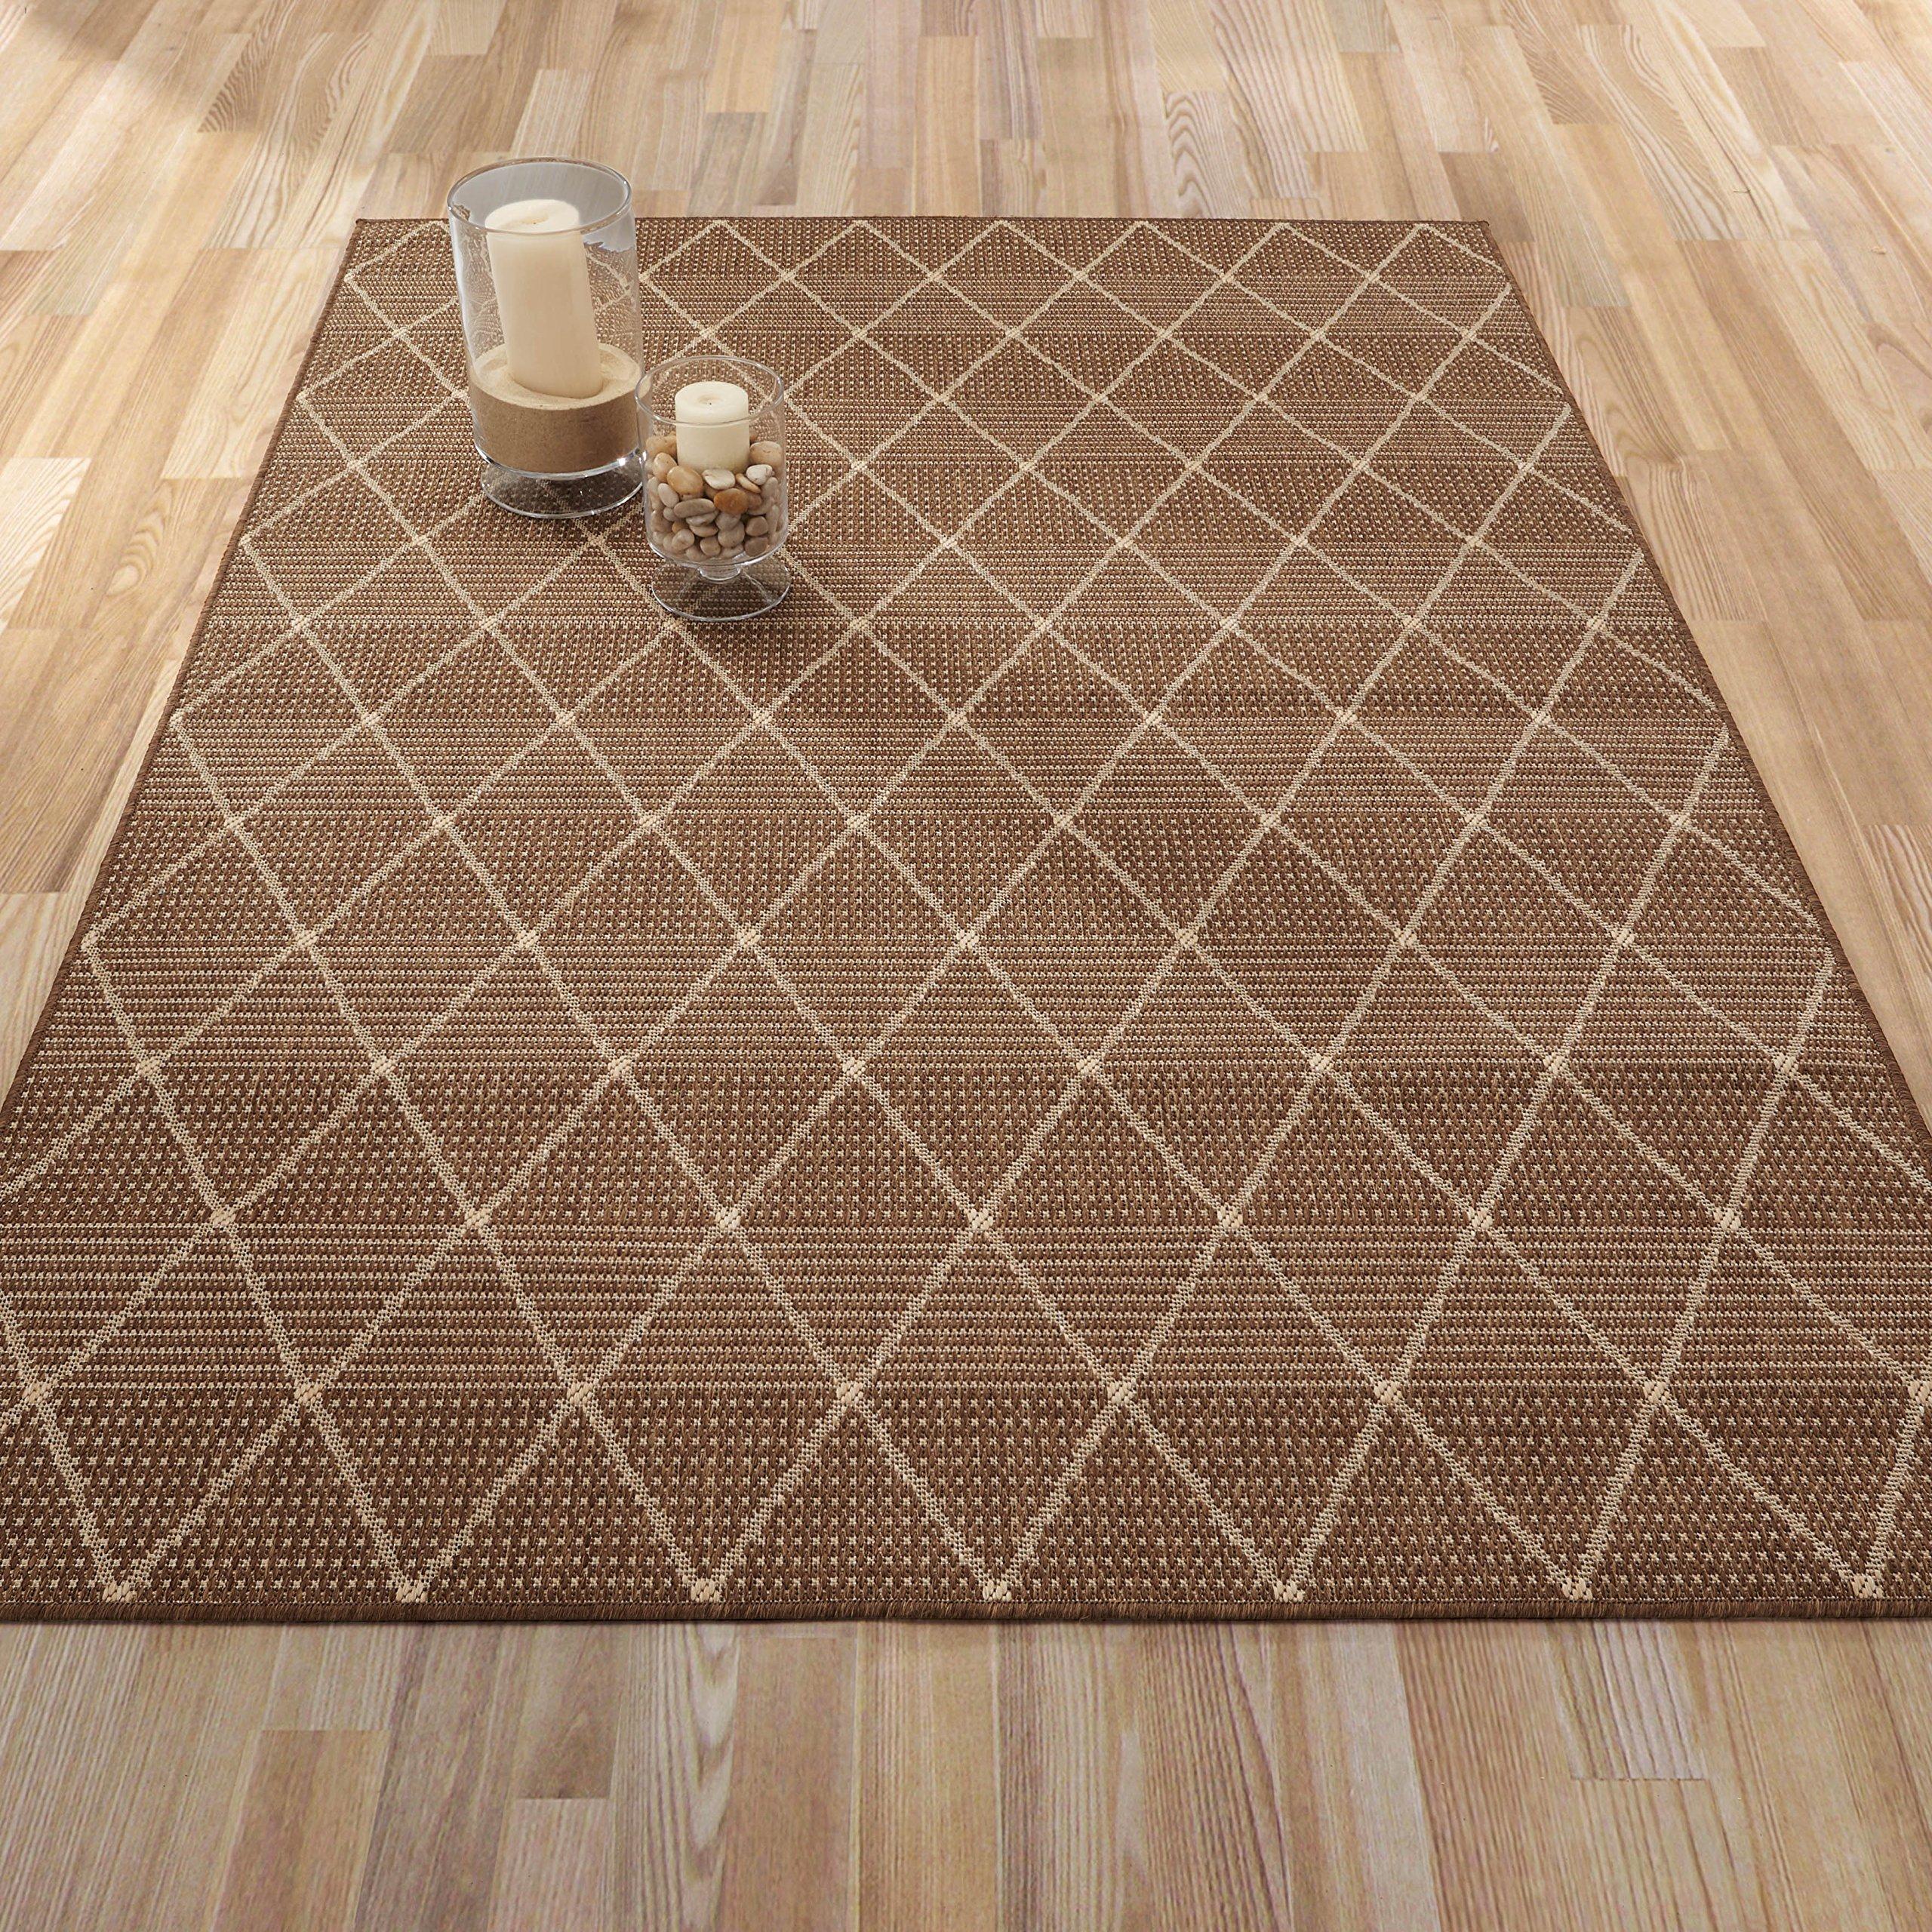 Ottomanson Jardin Collection Contemporary Trellis Design Indoor/Outdoor Jute Backing Area Synthetic Sisal Rug, Brown, 5'3'' x 7'3''